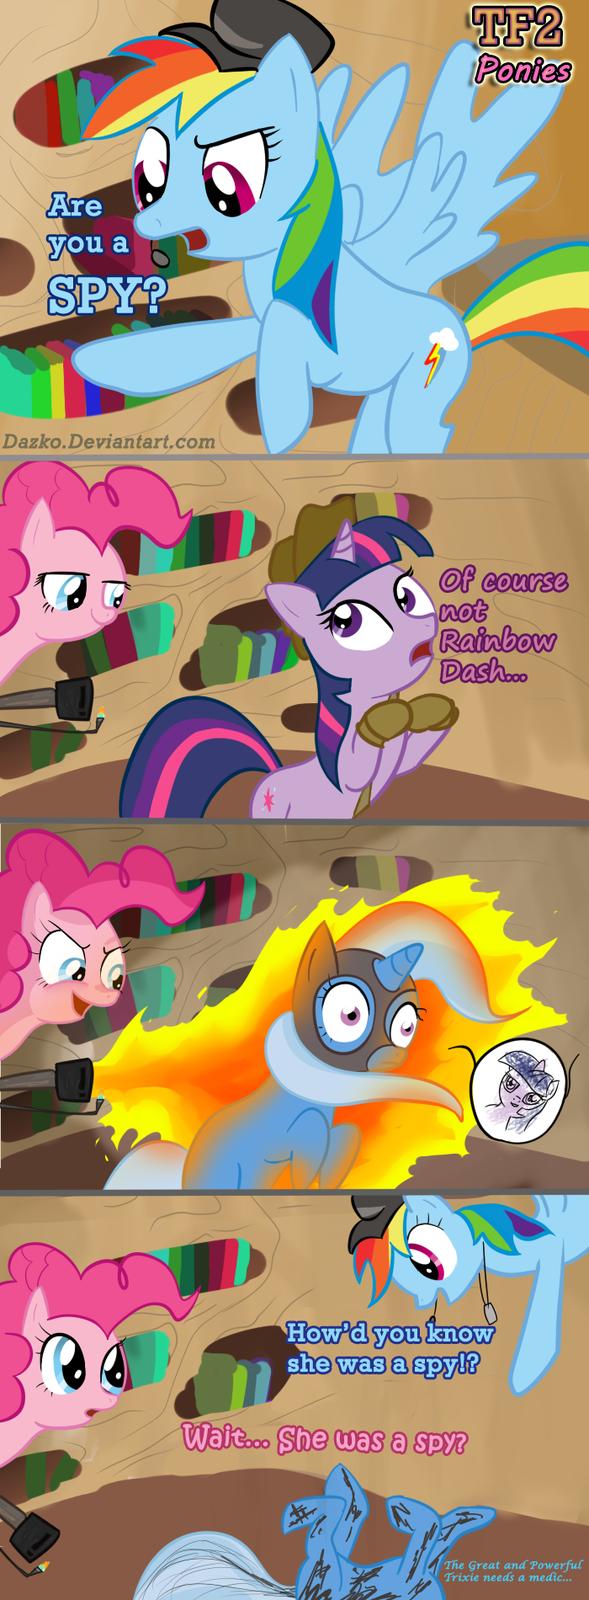 tf2_ponies_by_dazko-d4dpygg.png